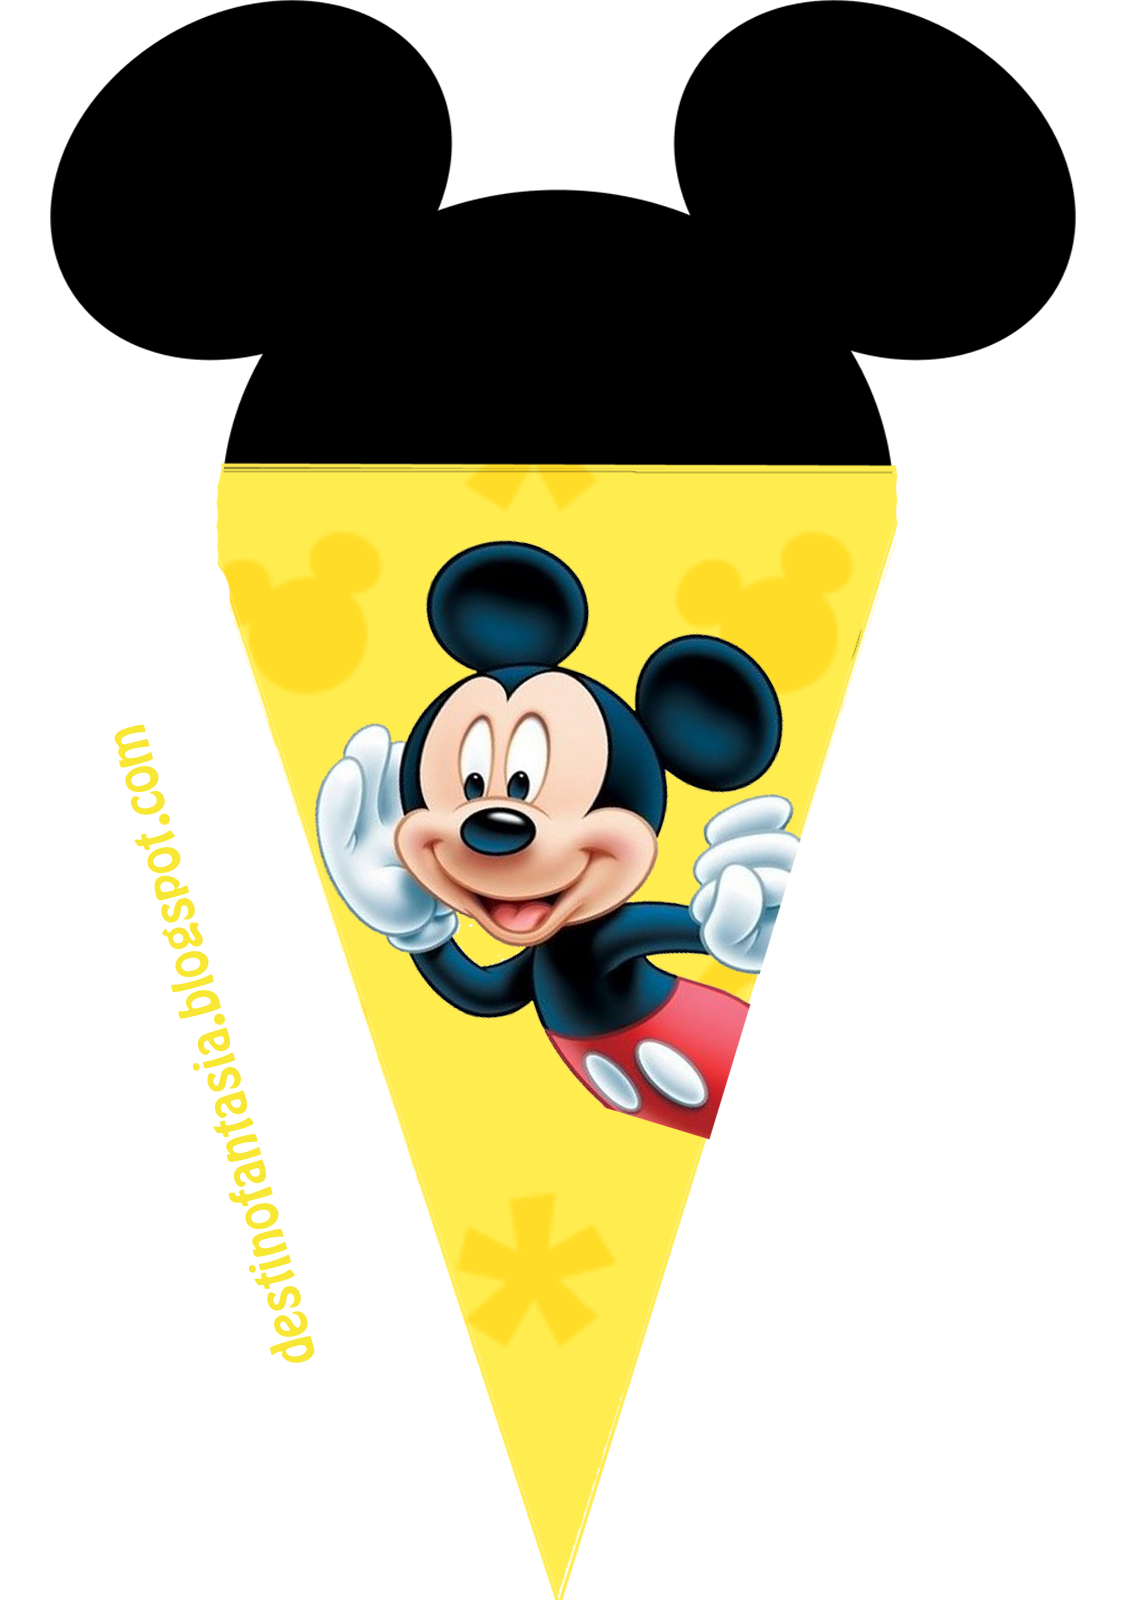 bandeirinha festa mickey